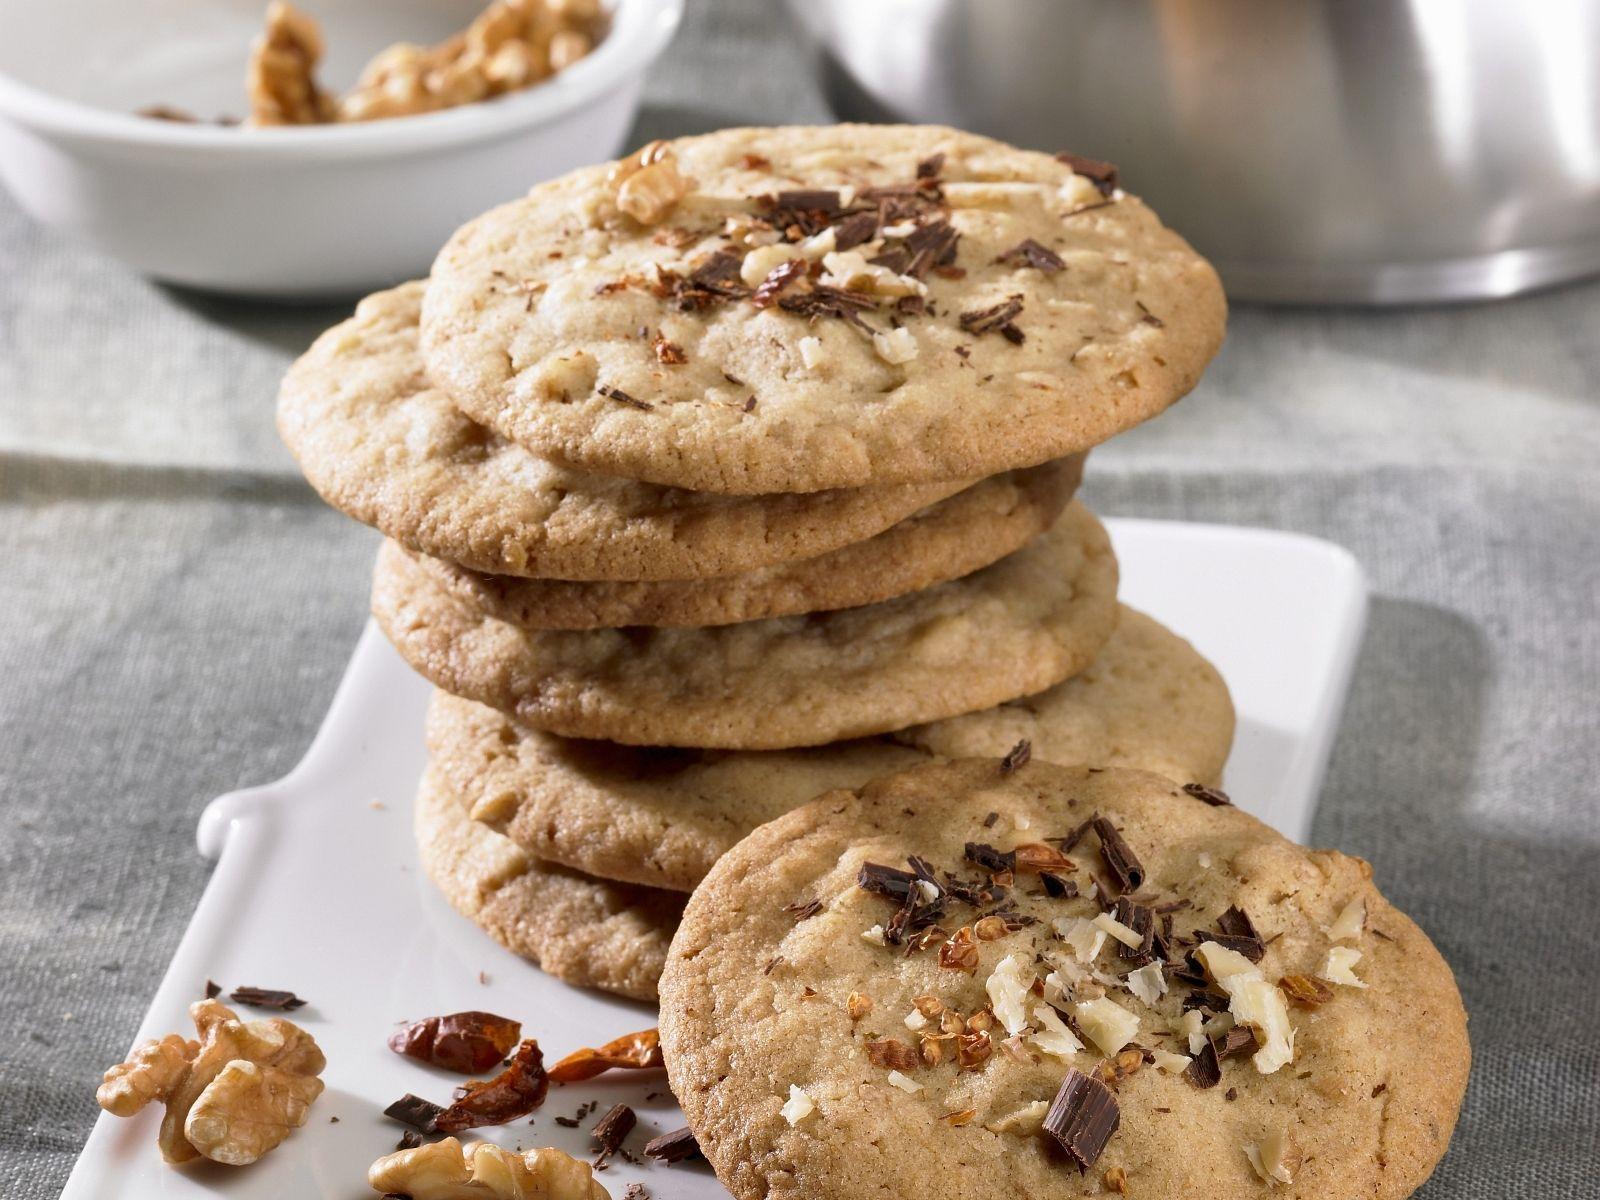 schnelle kekse rezepte ohne ei gesundes essen und rezepte foto blog. Black Bedroom Furniture Sets. Home Design Ideas